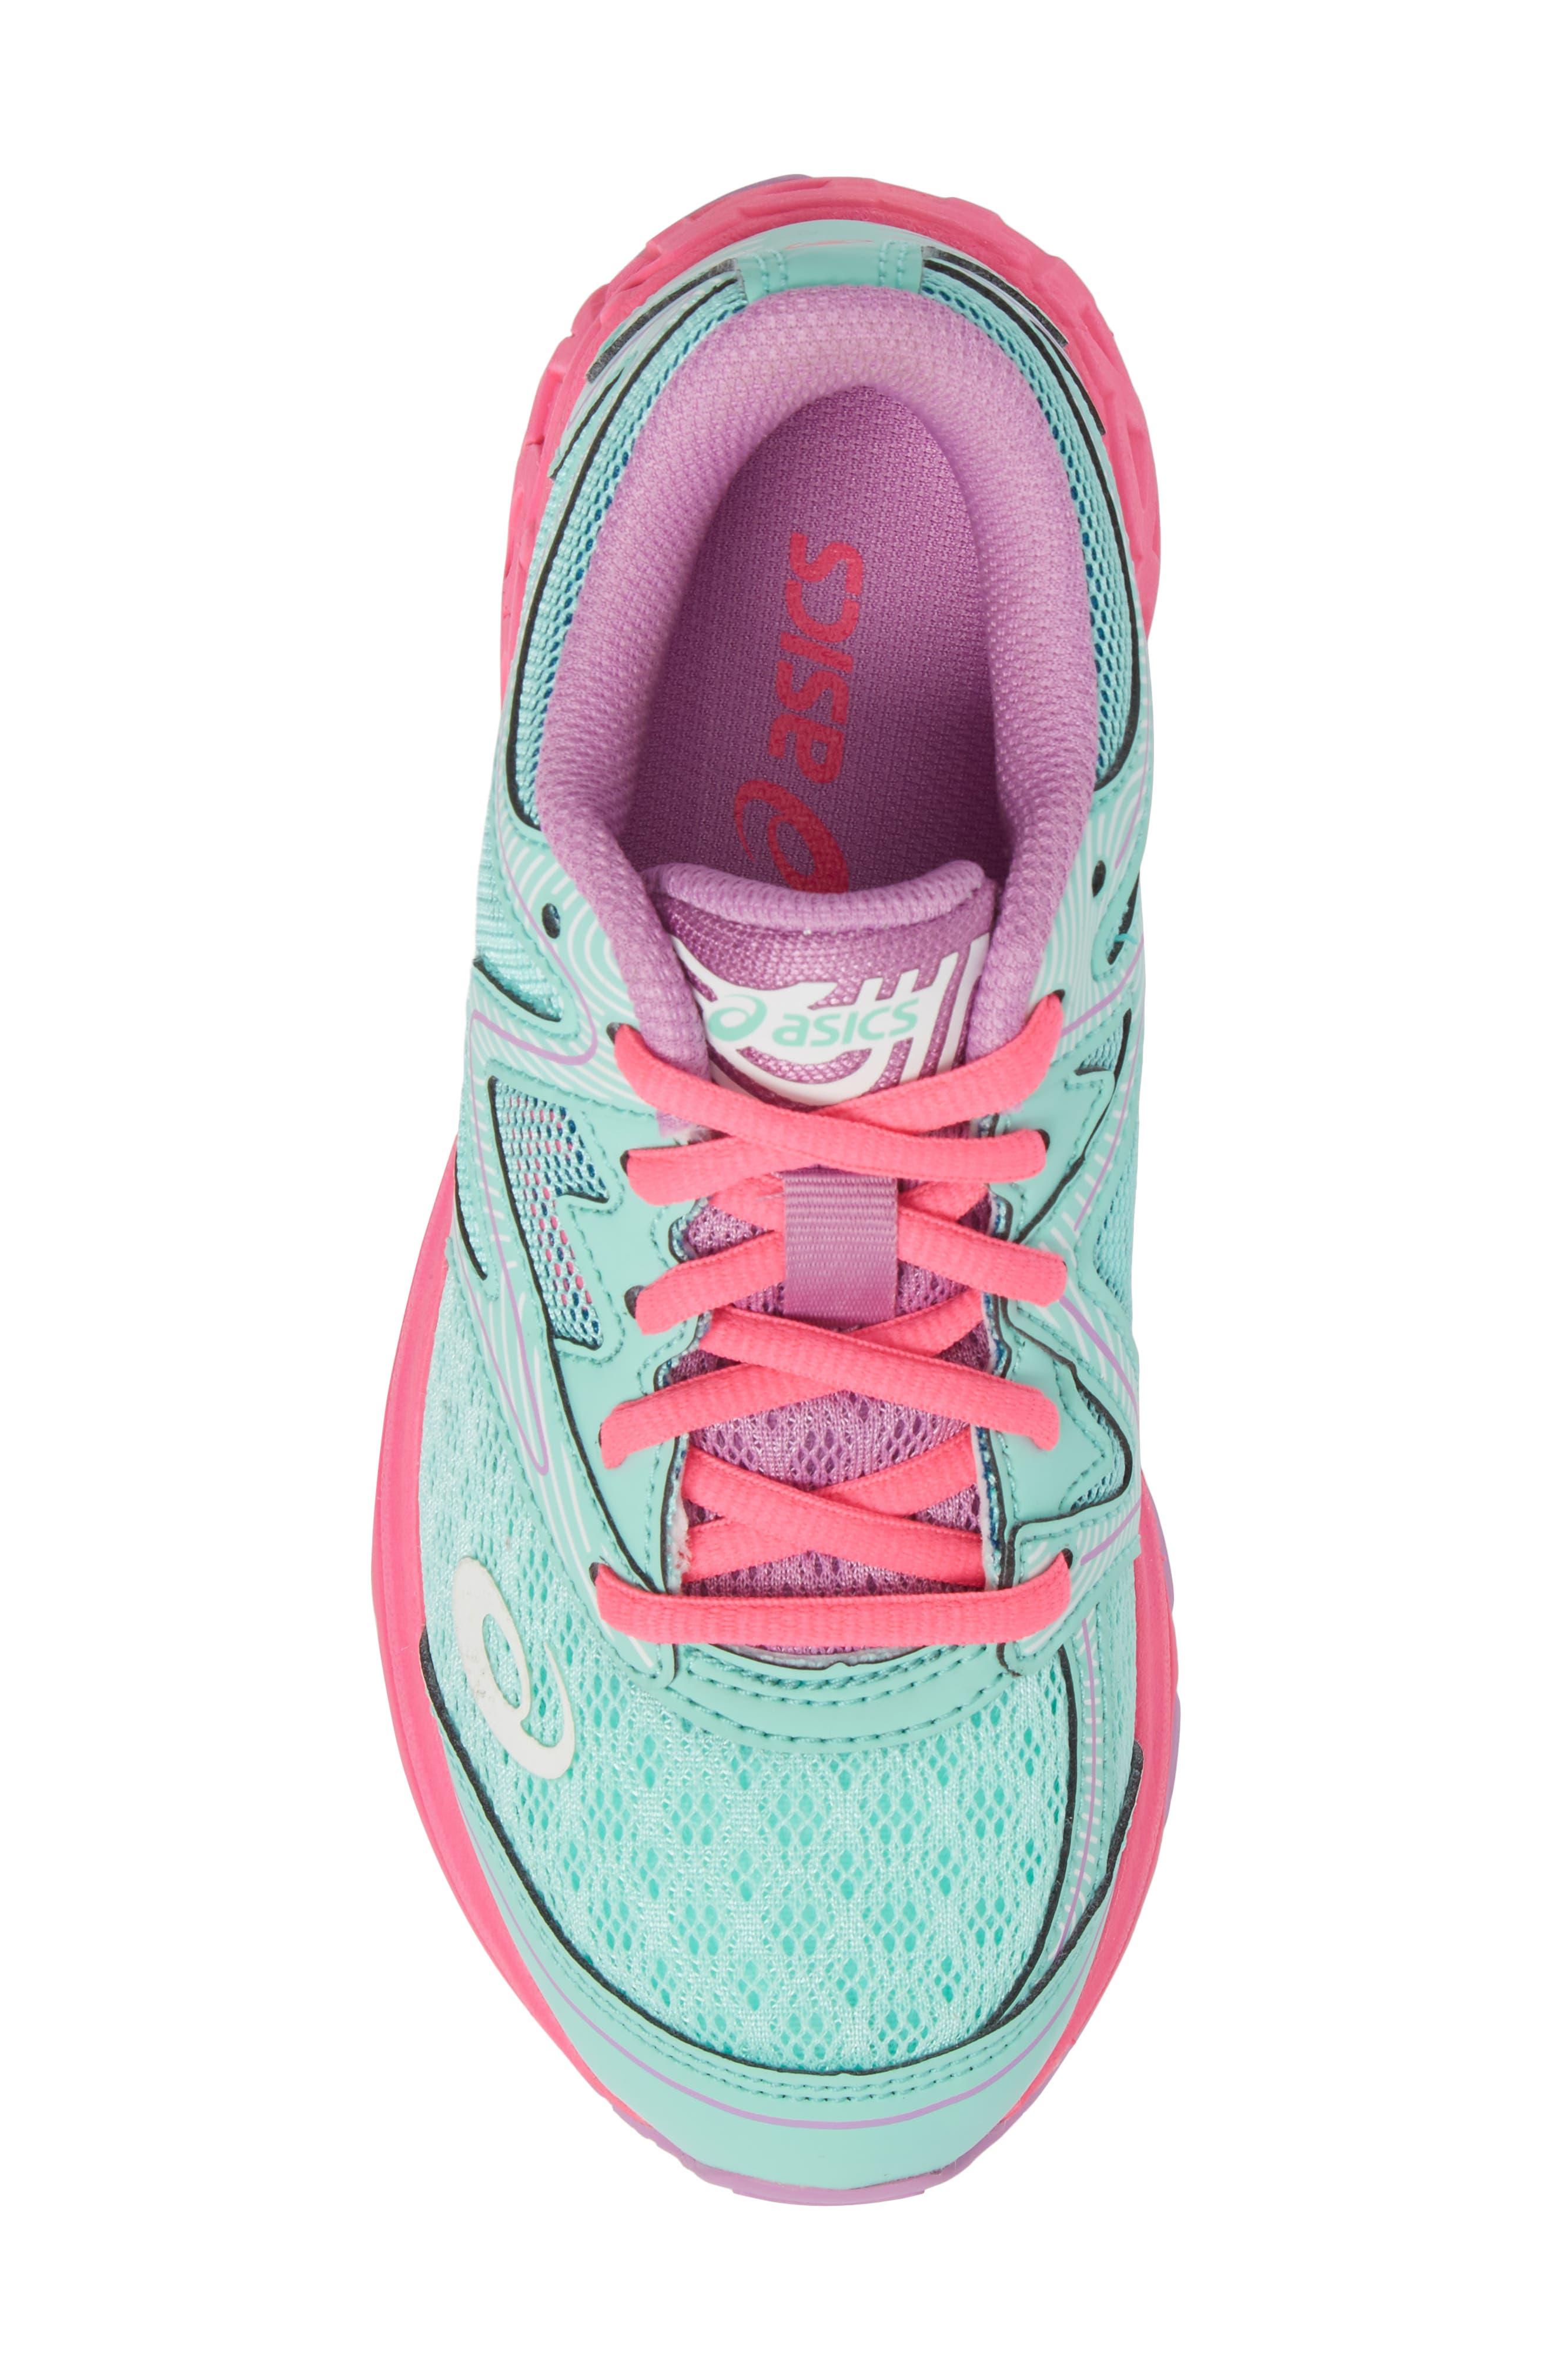 Noosa GS Sneaker,                             Alternate thumbnail 5, color,                             330